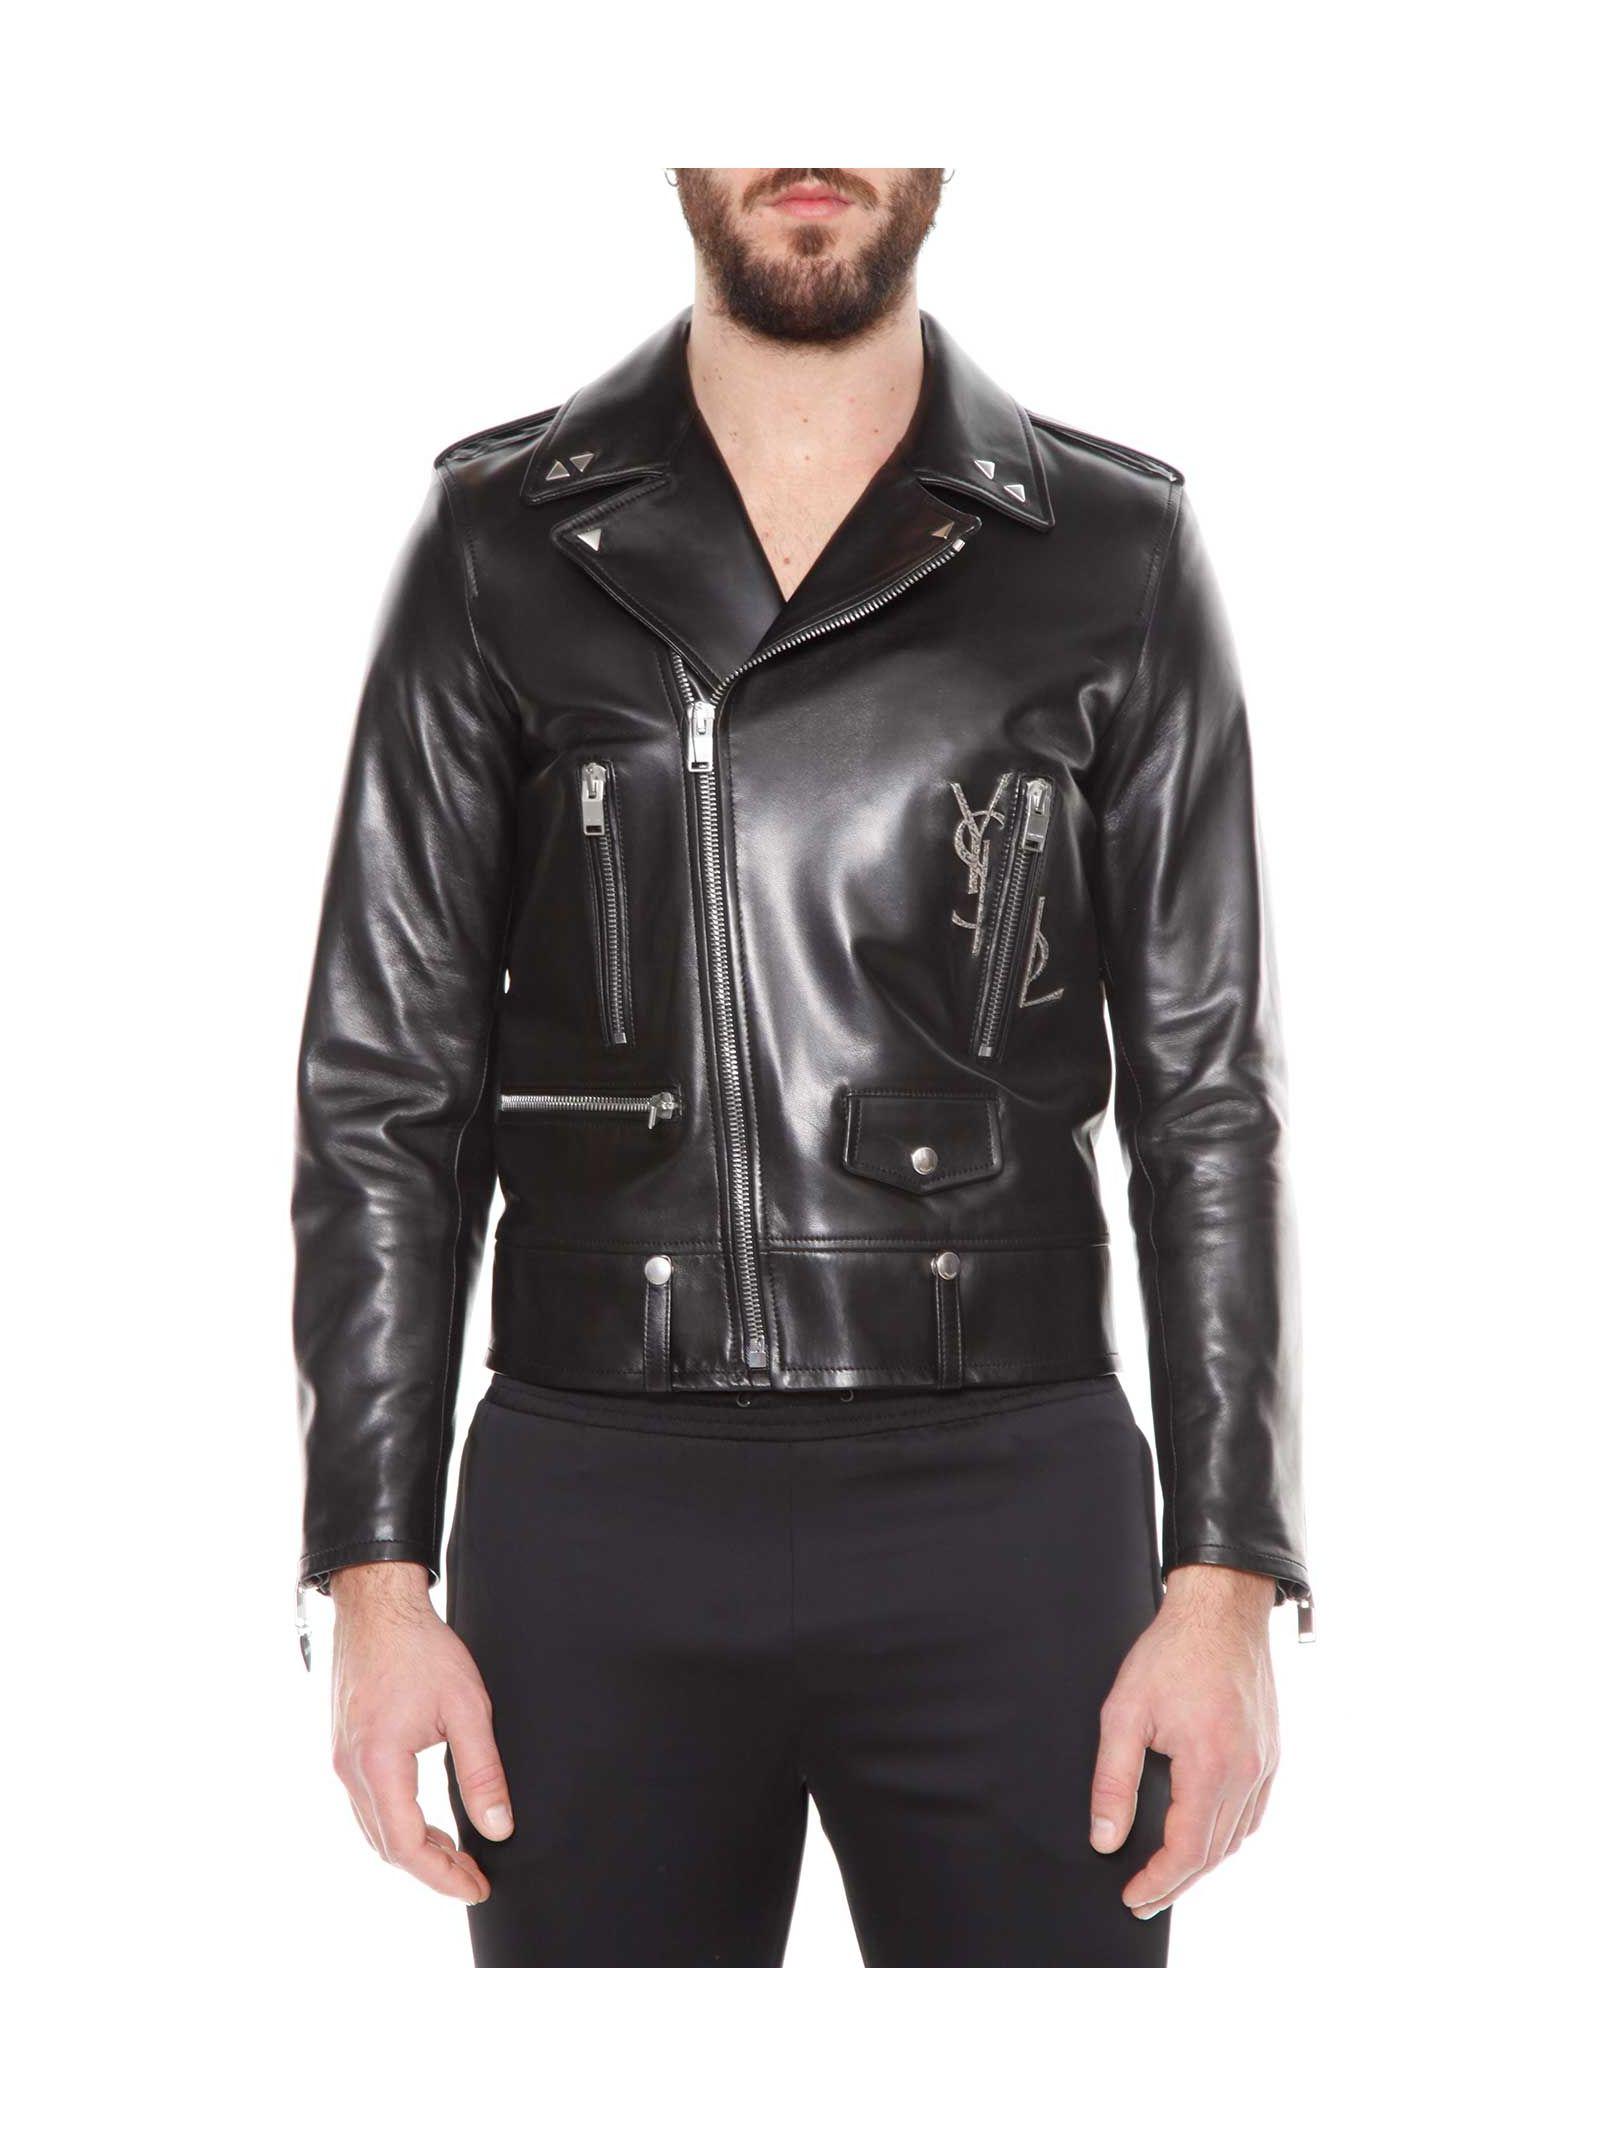 Saint Laurent Classic Motorcycle Leather Ysl Jacket